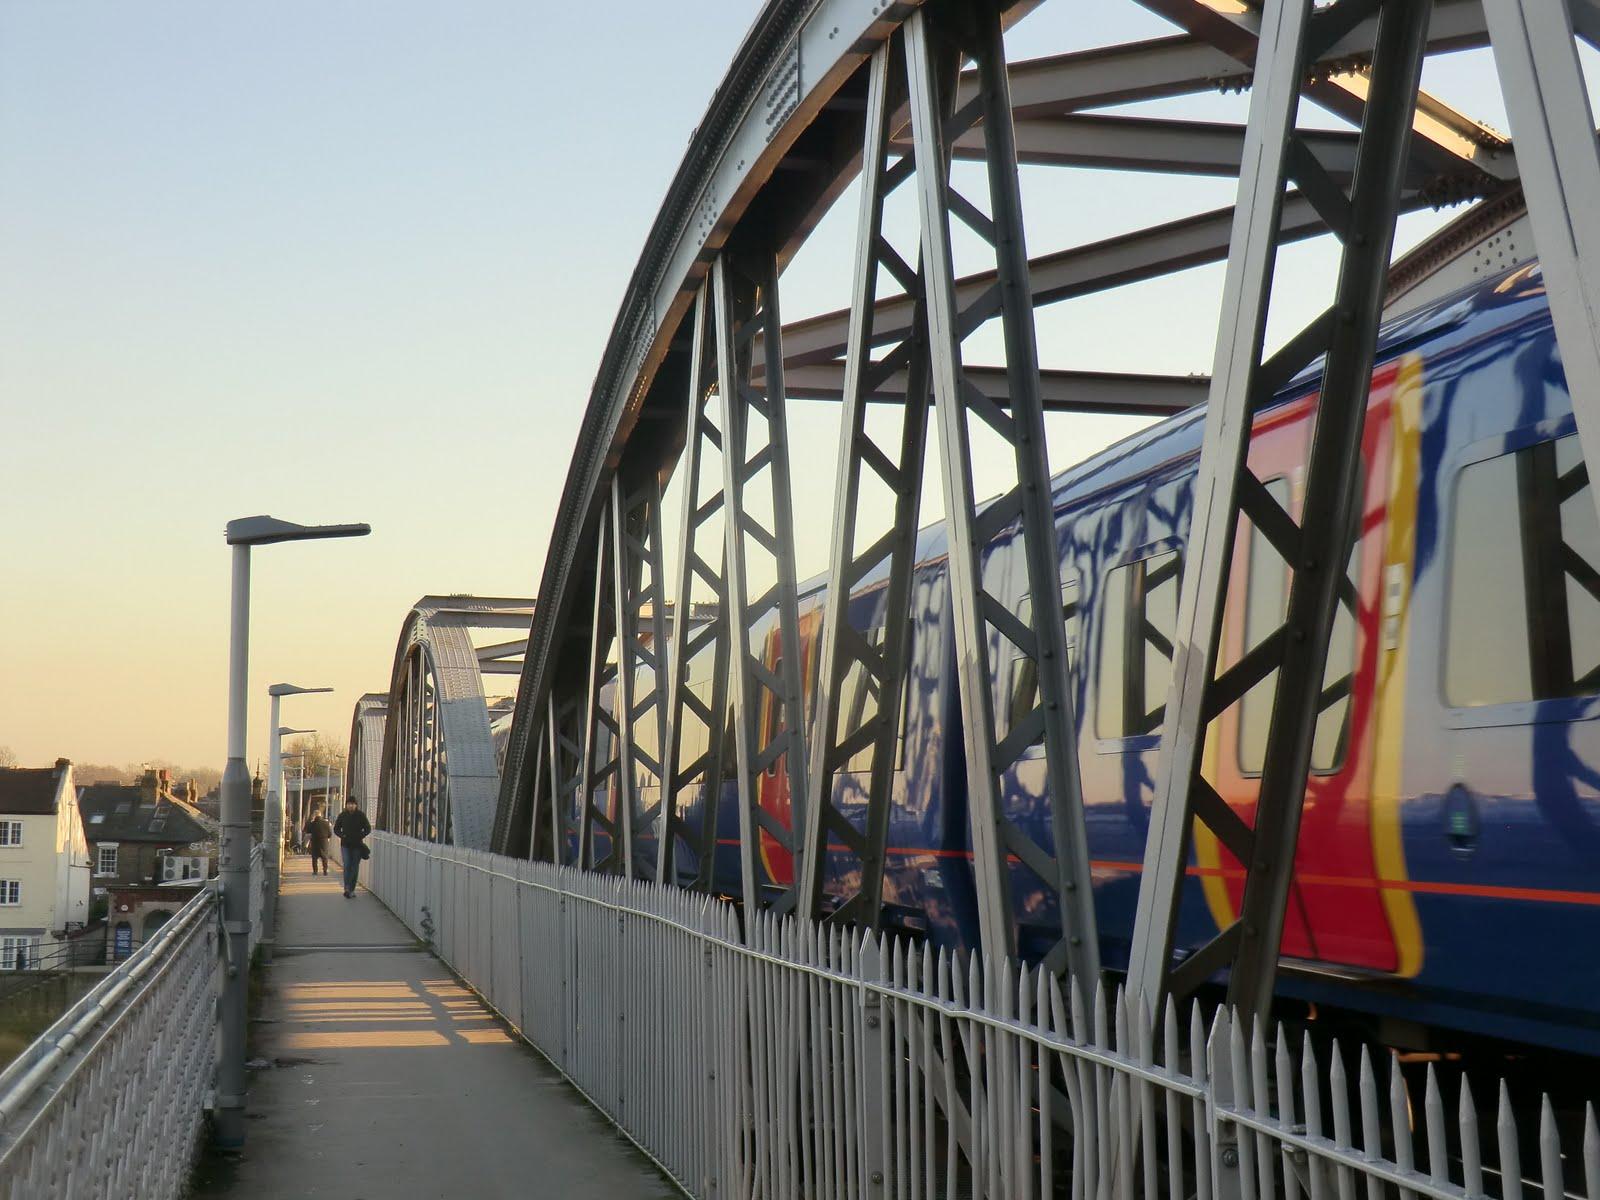 CIMG2393 Across Barnes Railway Bridge